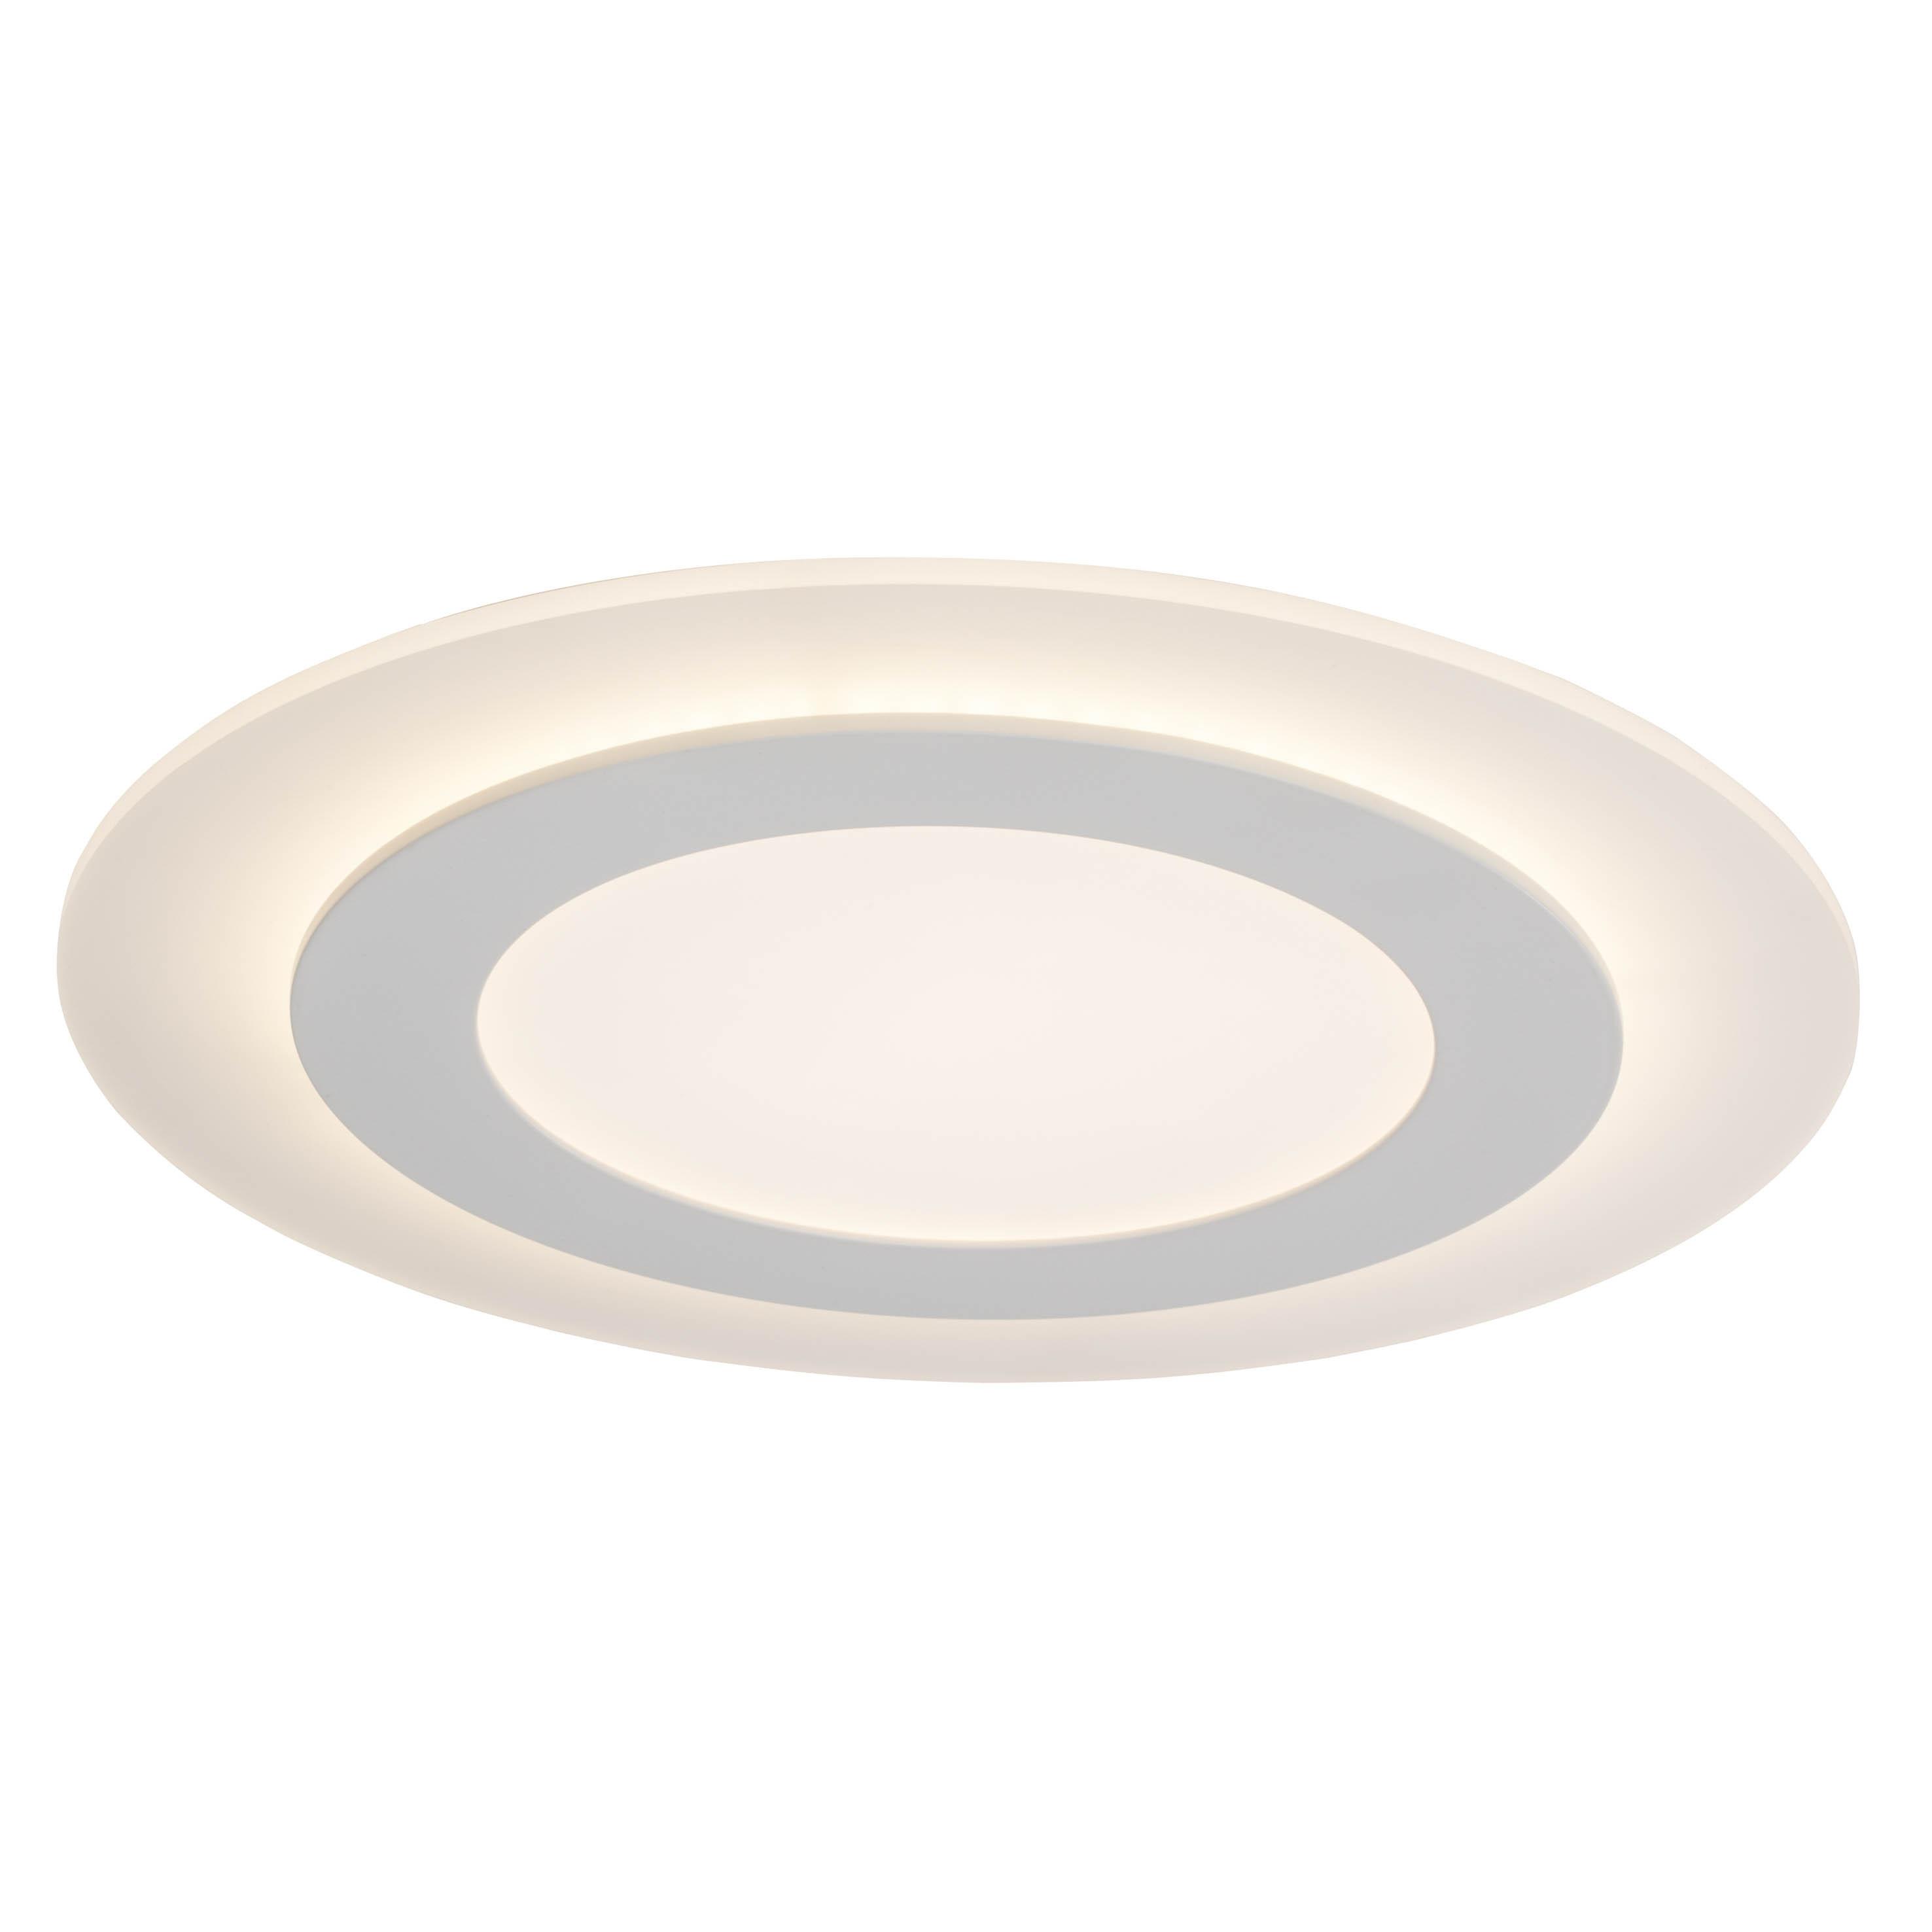 AEG Karia LED Deckenleuchte 35cm weiß